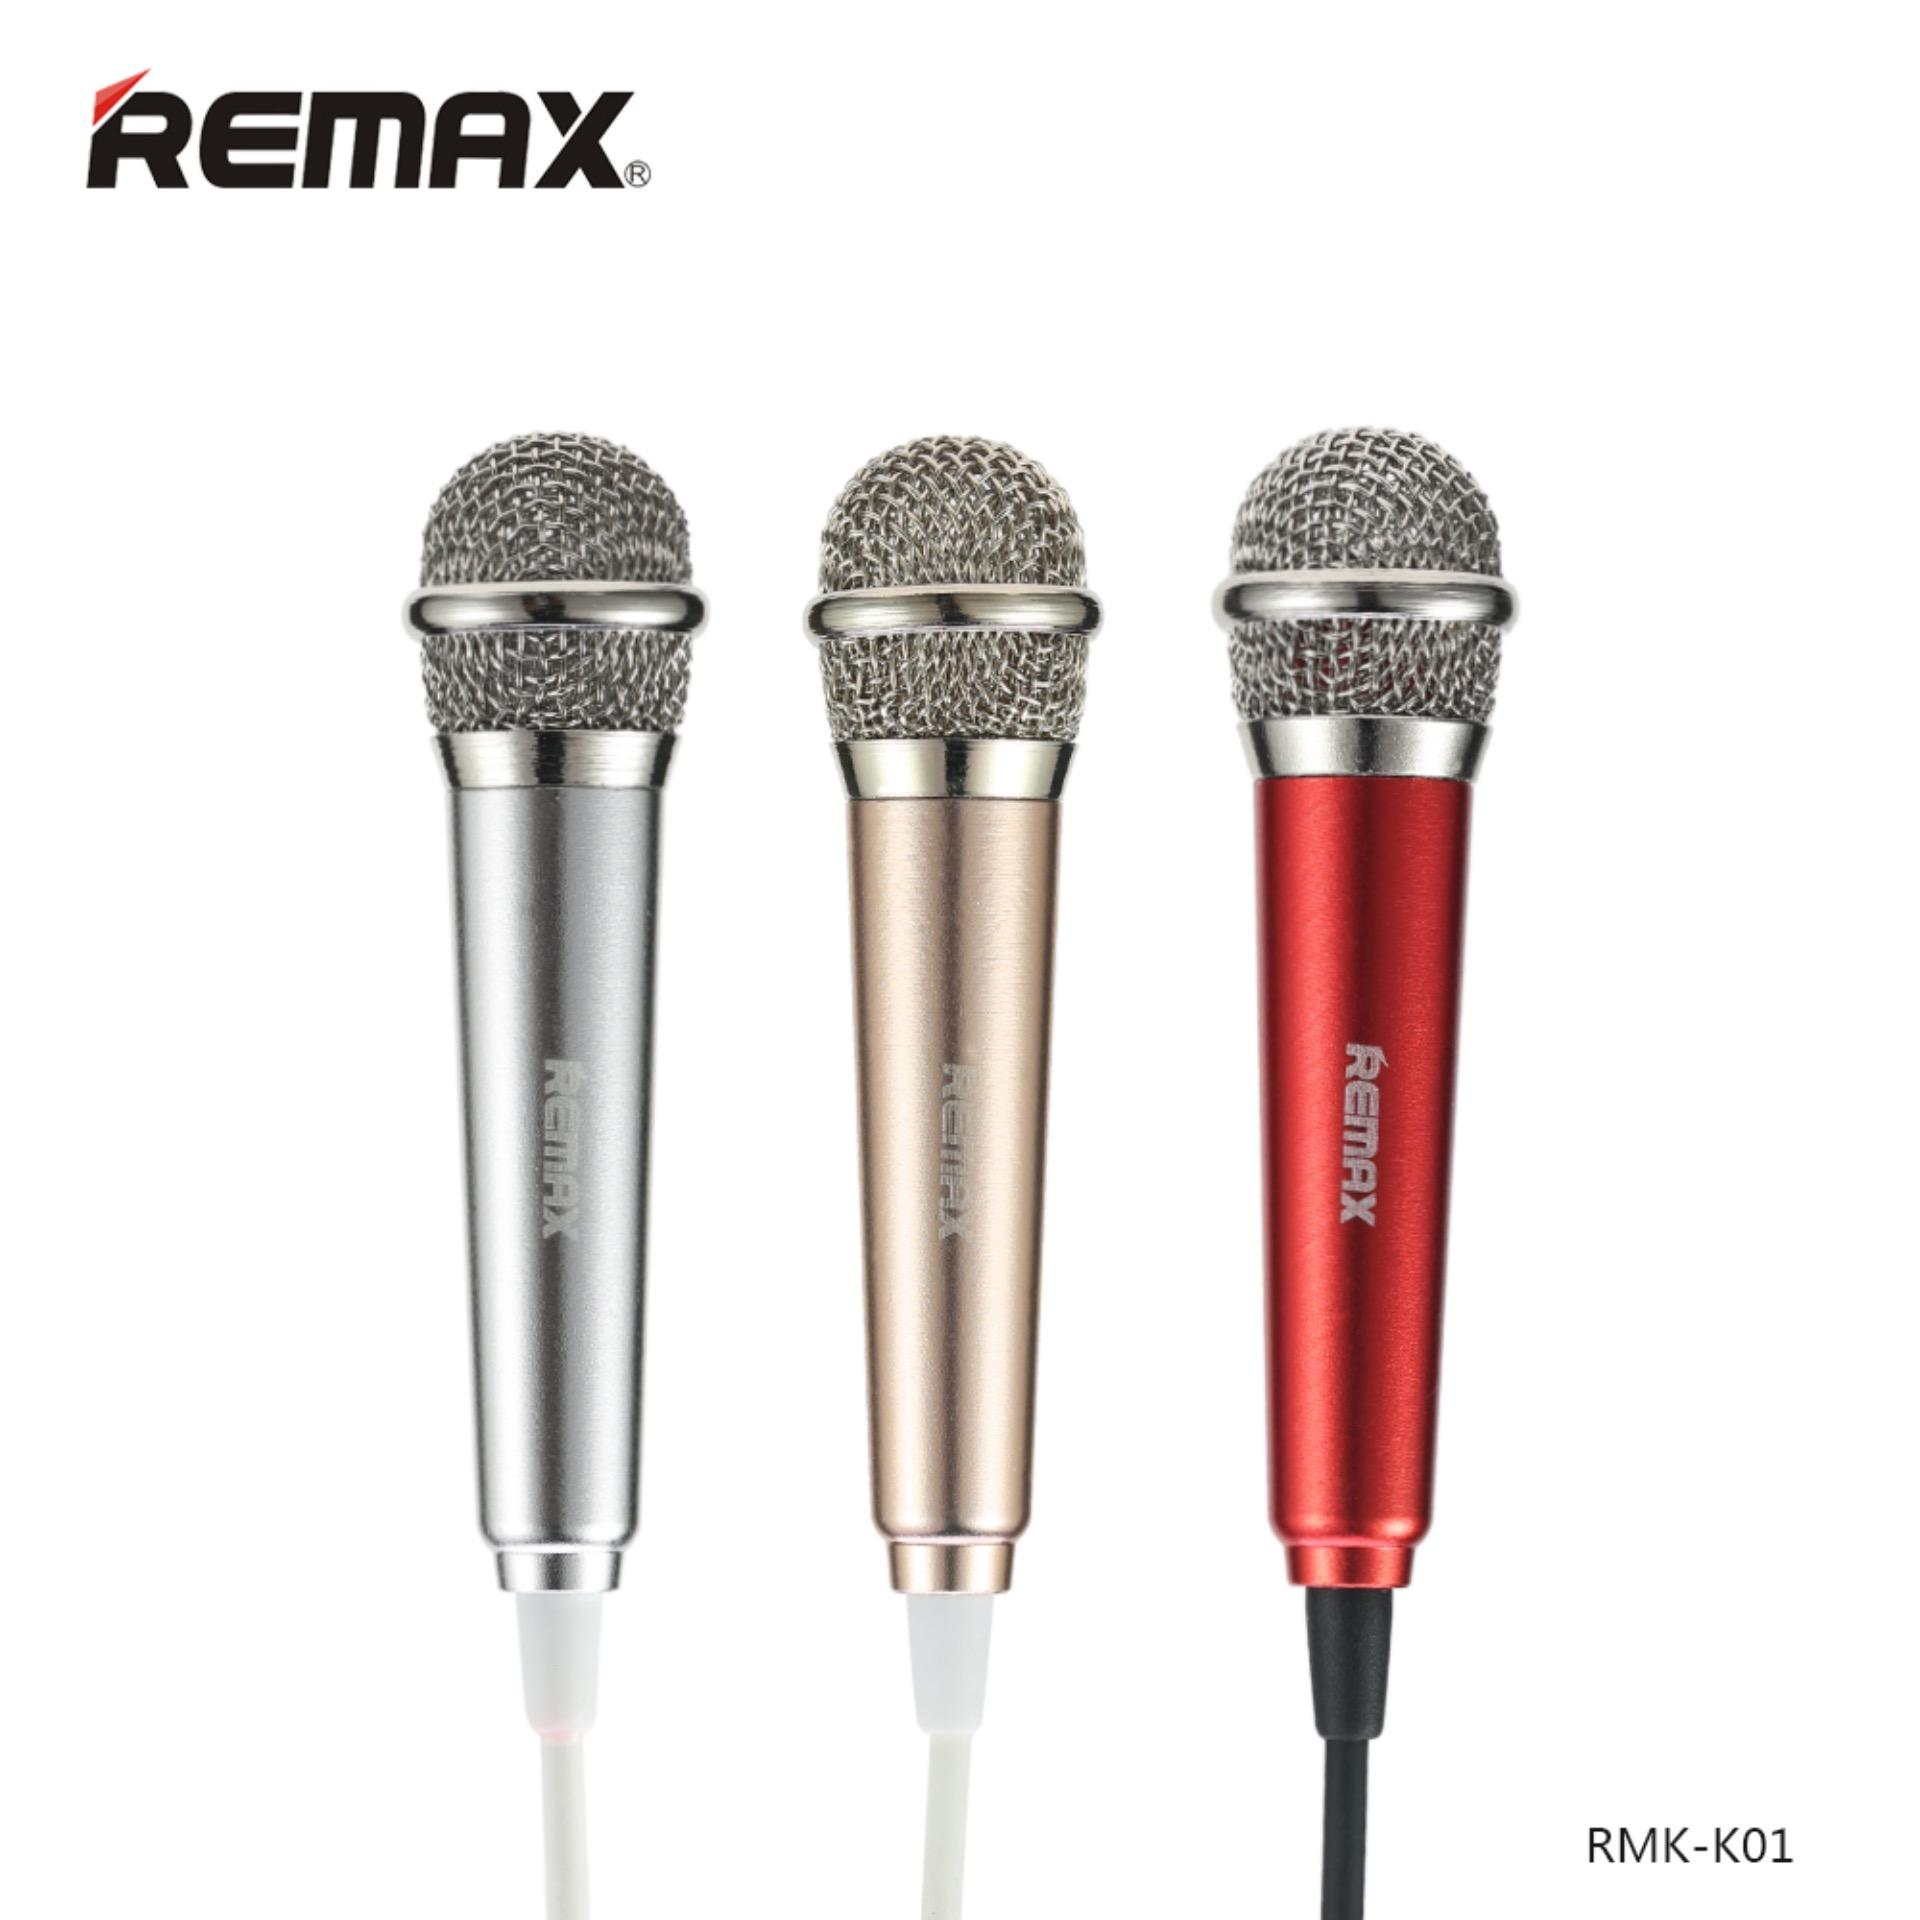 Remax Singsong K Mini Microphone RMK-K01 Mic Mikrofon .